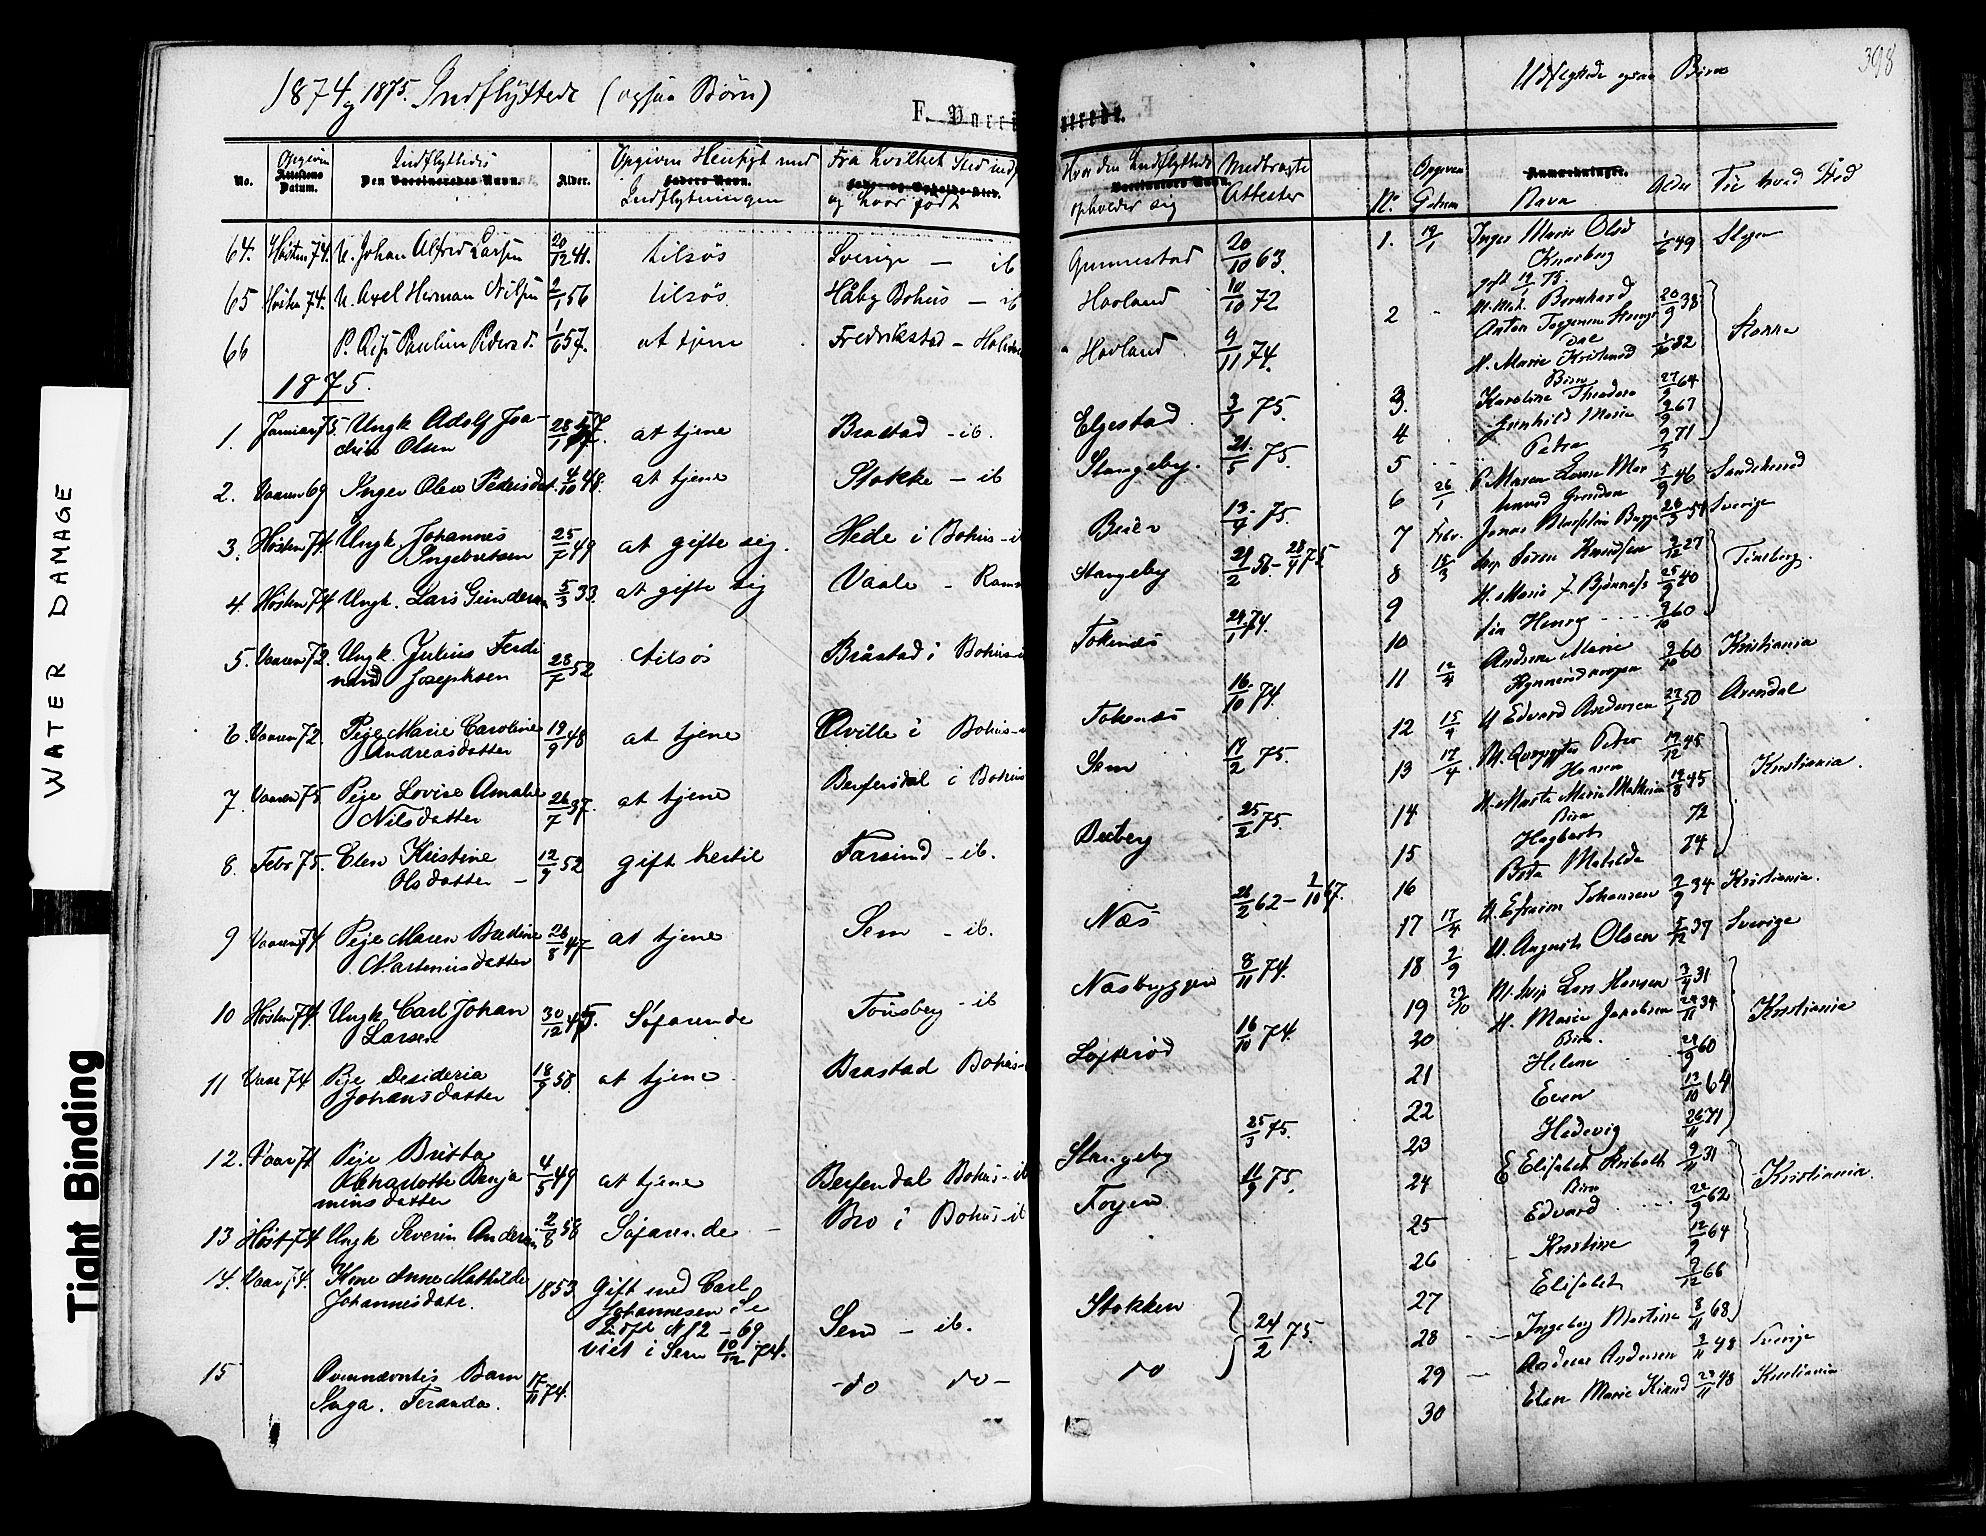 SAKO, Nøtterøy kirkebøker, F/Fa/L0007: Ministerialbok nr. I 7, 1865-1877, s. 398